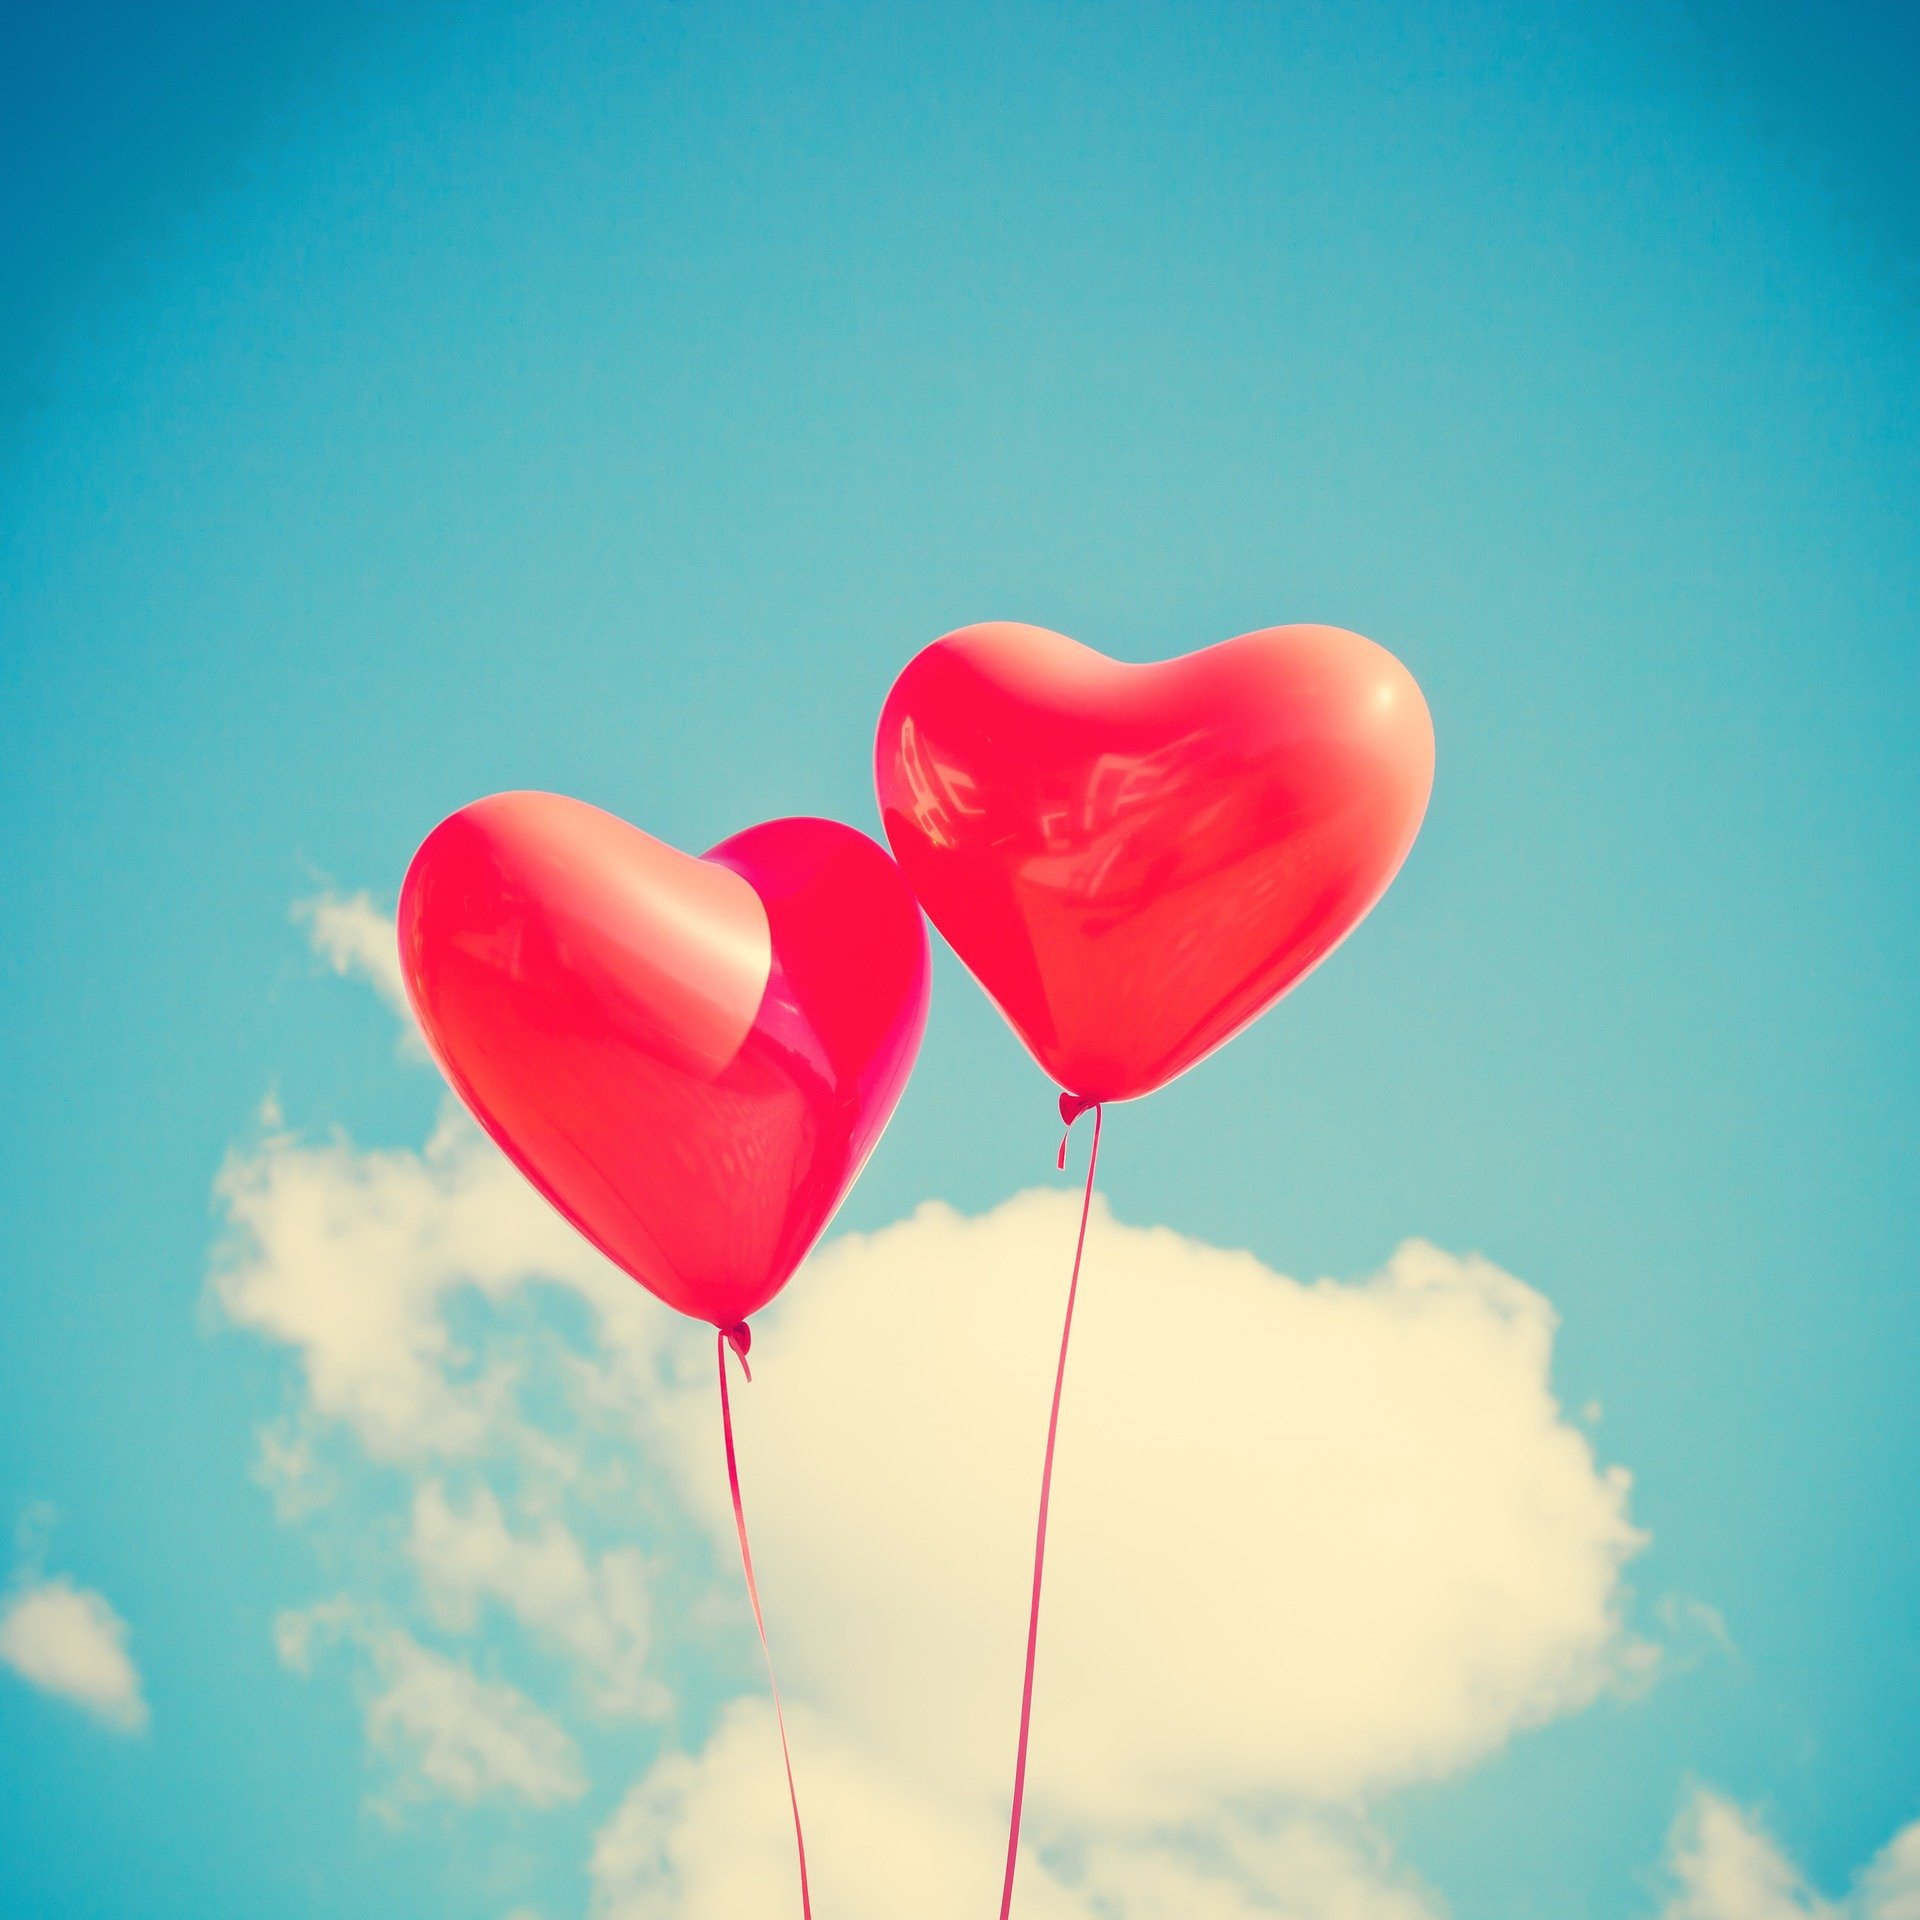 Love & Relationships Adventure